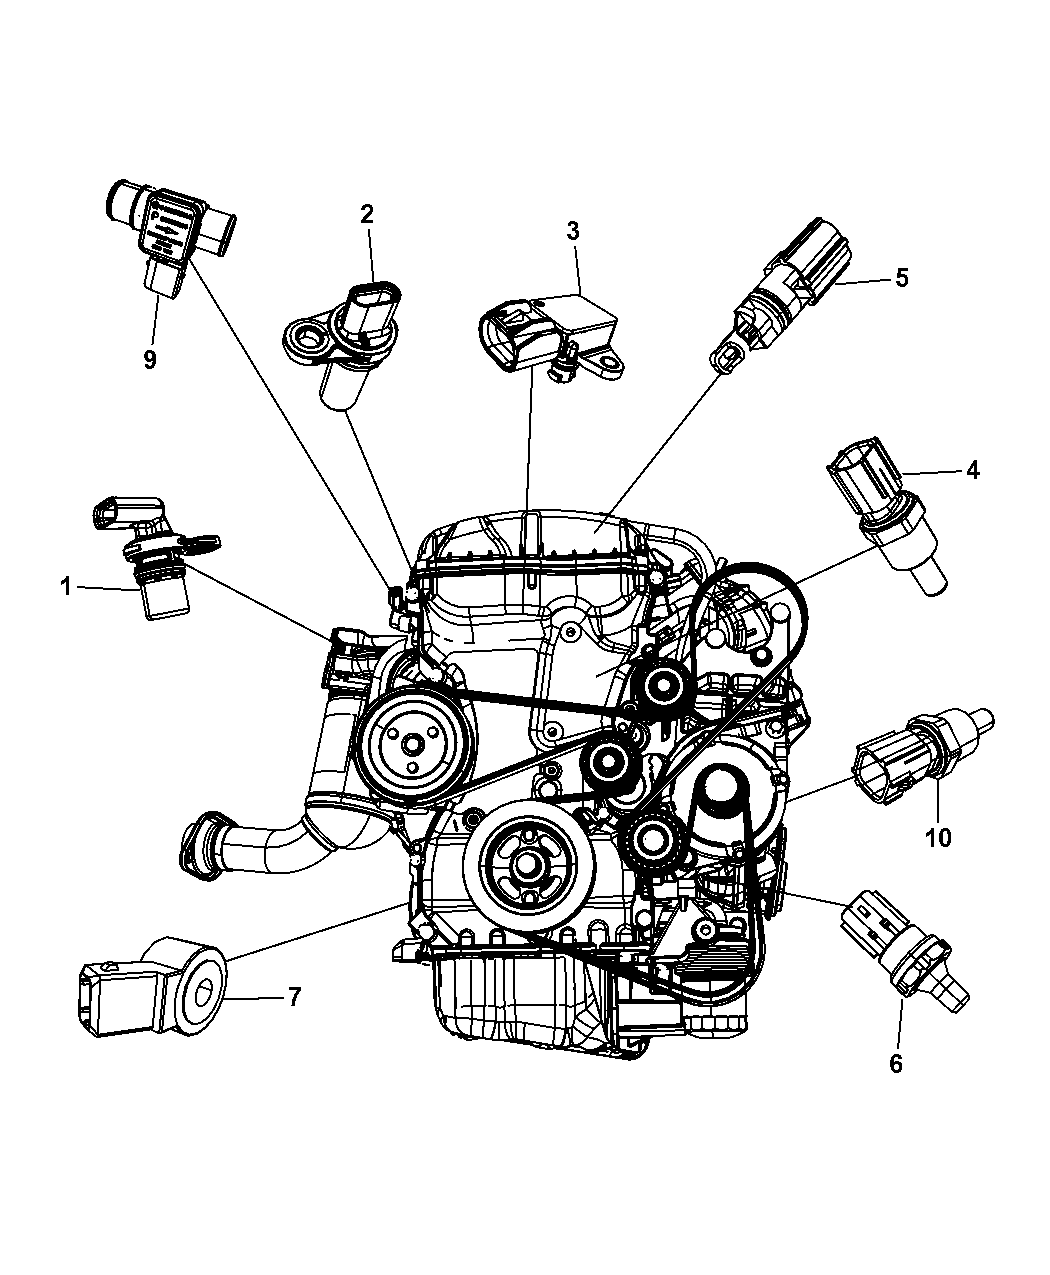 2012 Dodge Avenger Sensors Engine Mopar Parts Giant